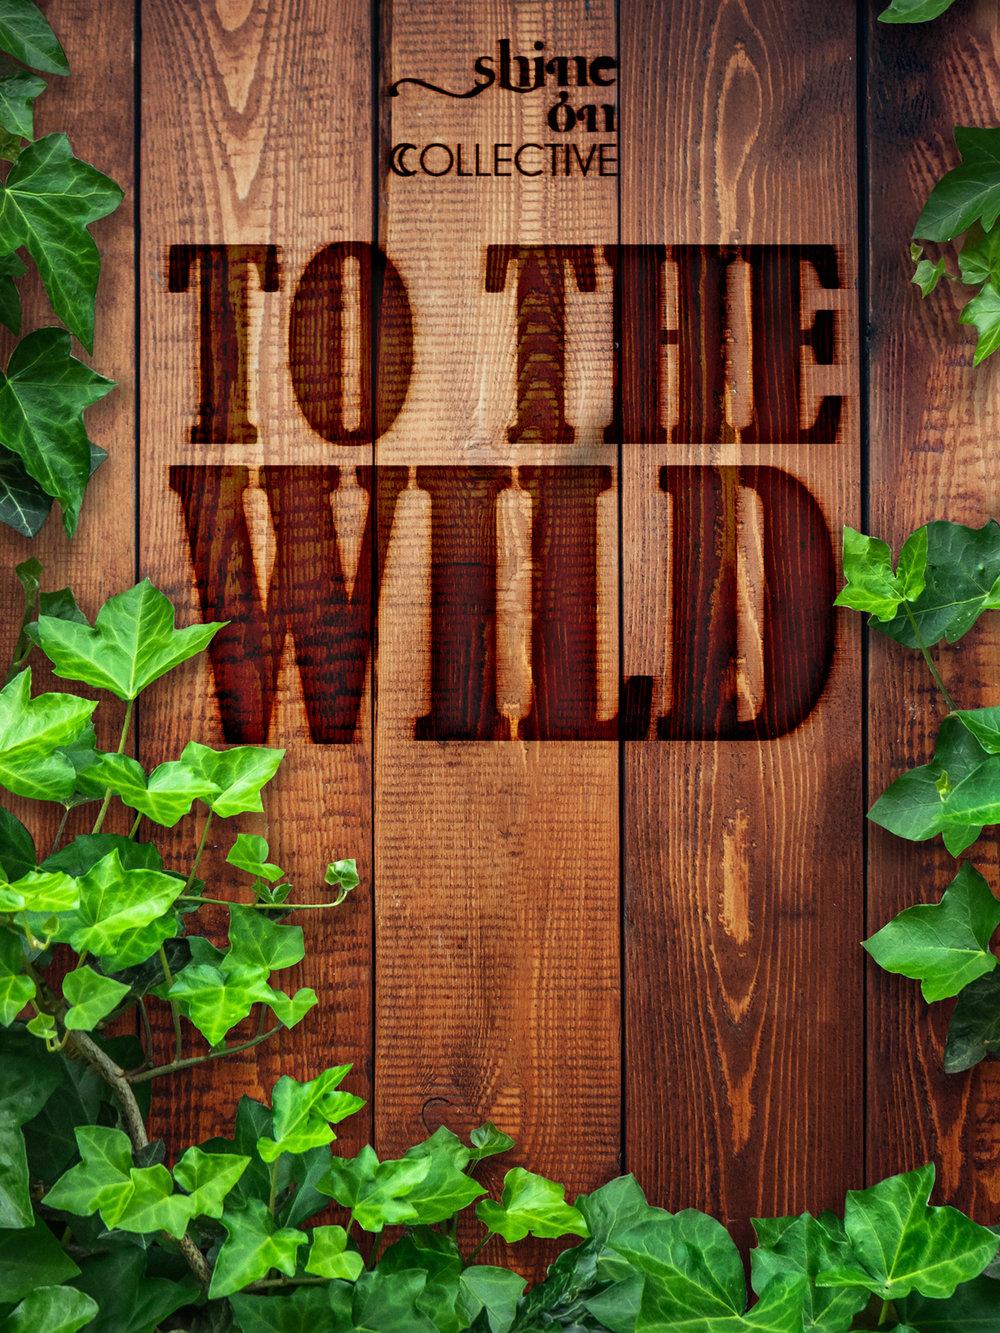 To The Wild